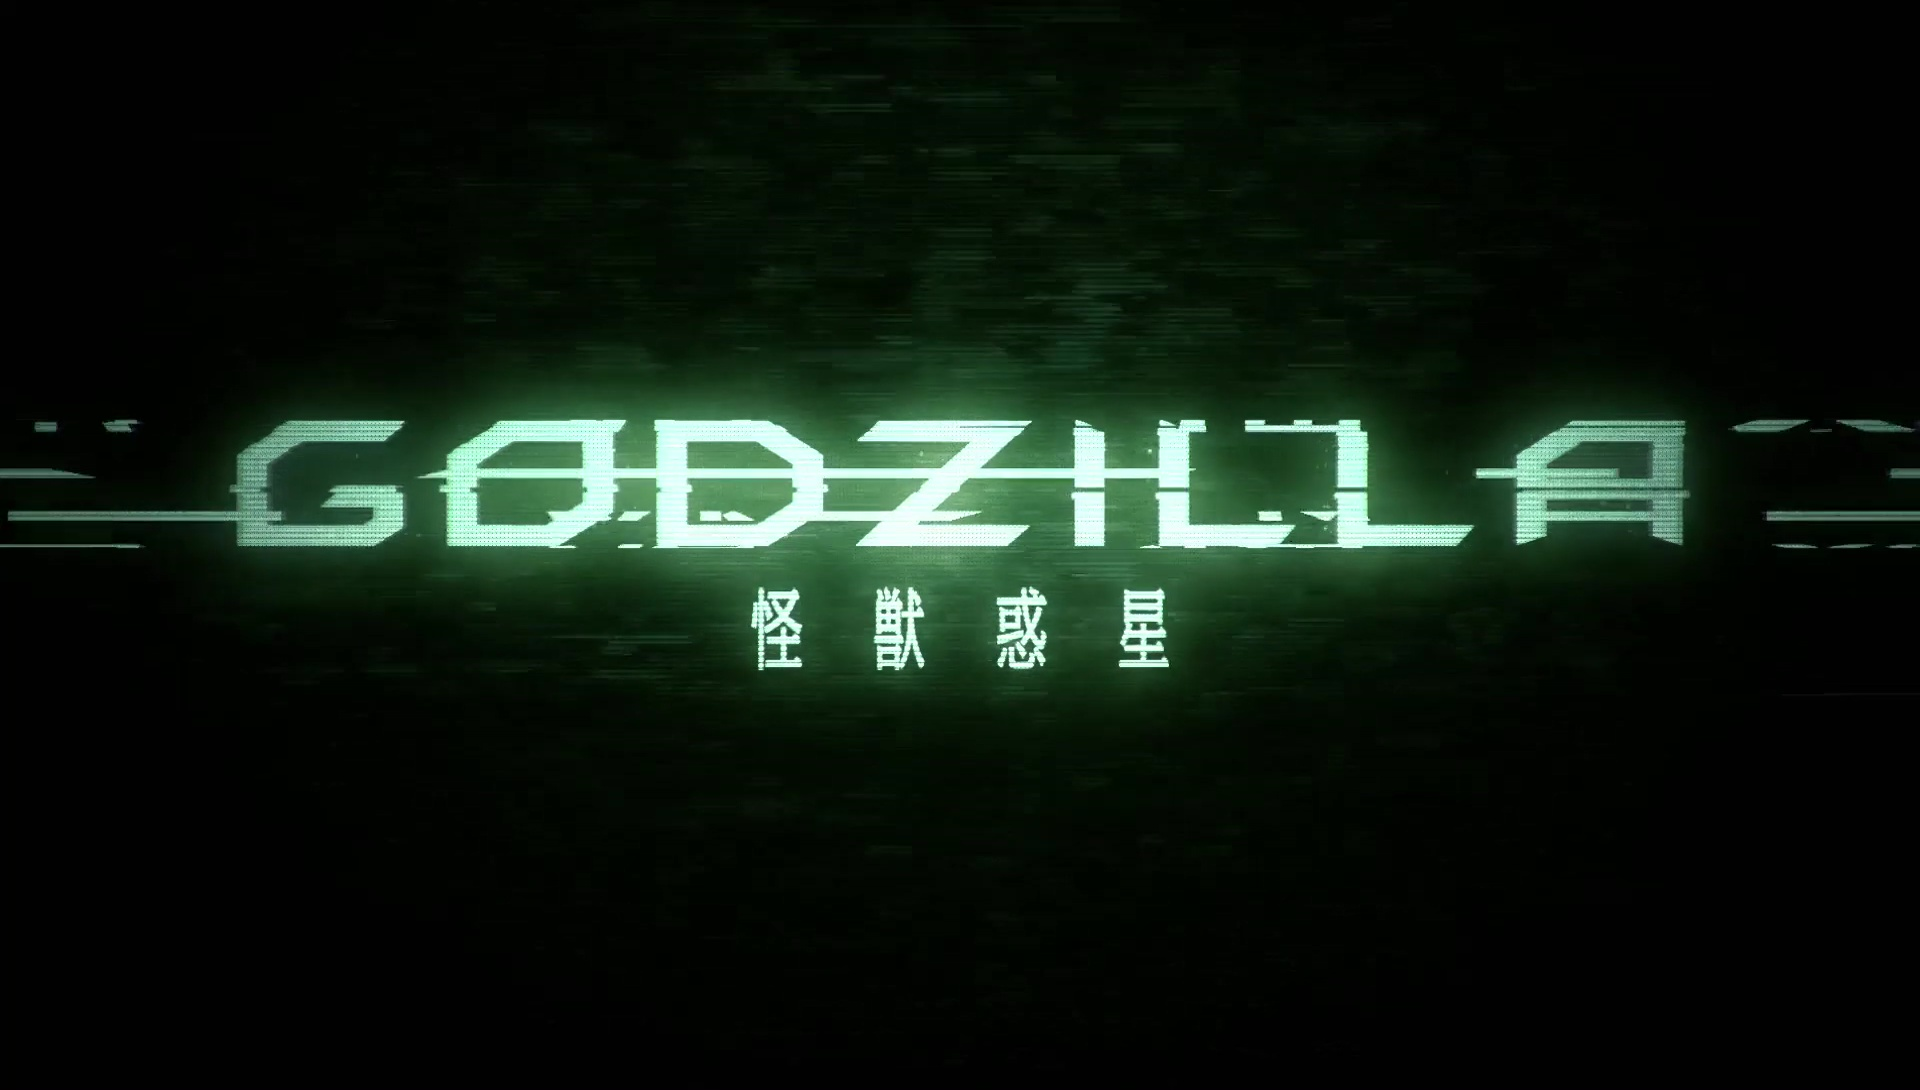 GODZILLA : LA PLANÈTE DES MONSTRES (GODZILLA -怪獣惑星) de Shizuno Kôbun et Seshita Hiroyuki (2017)